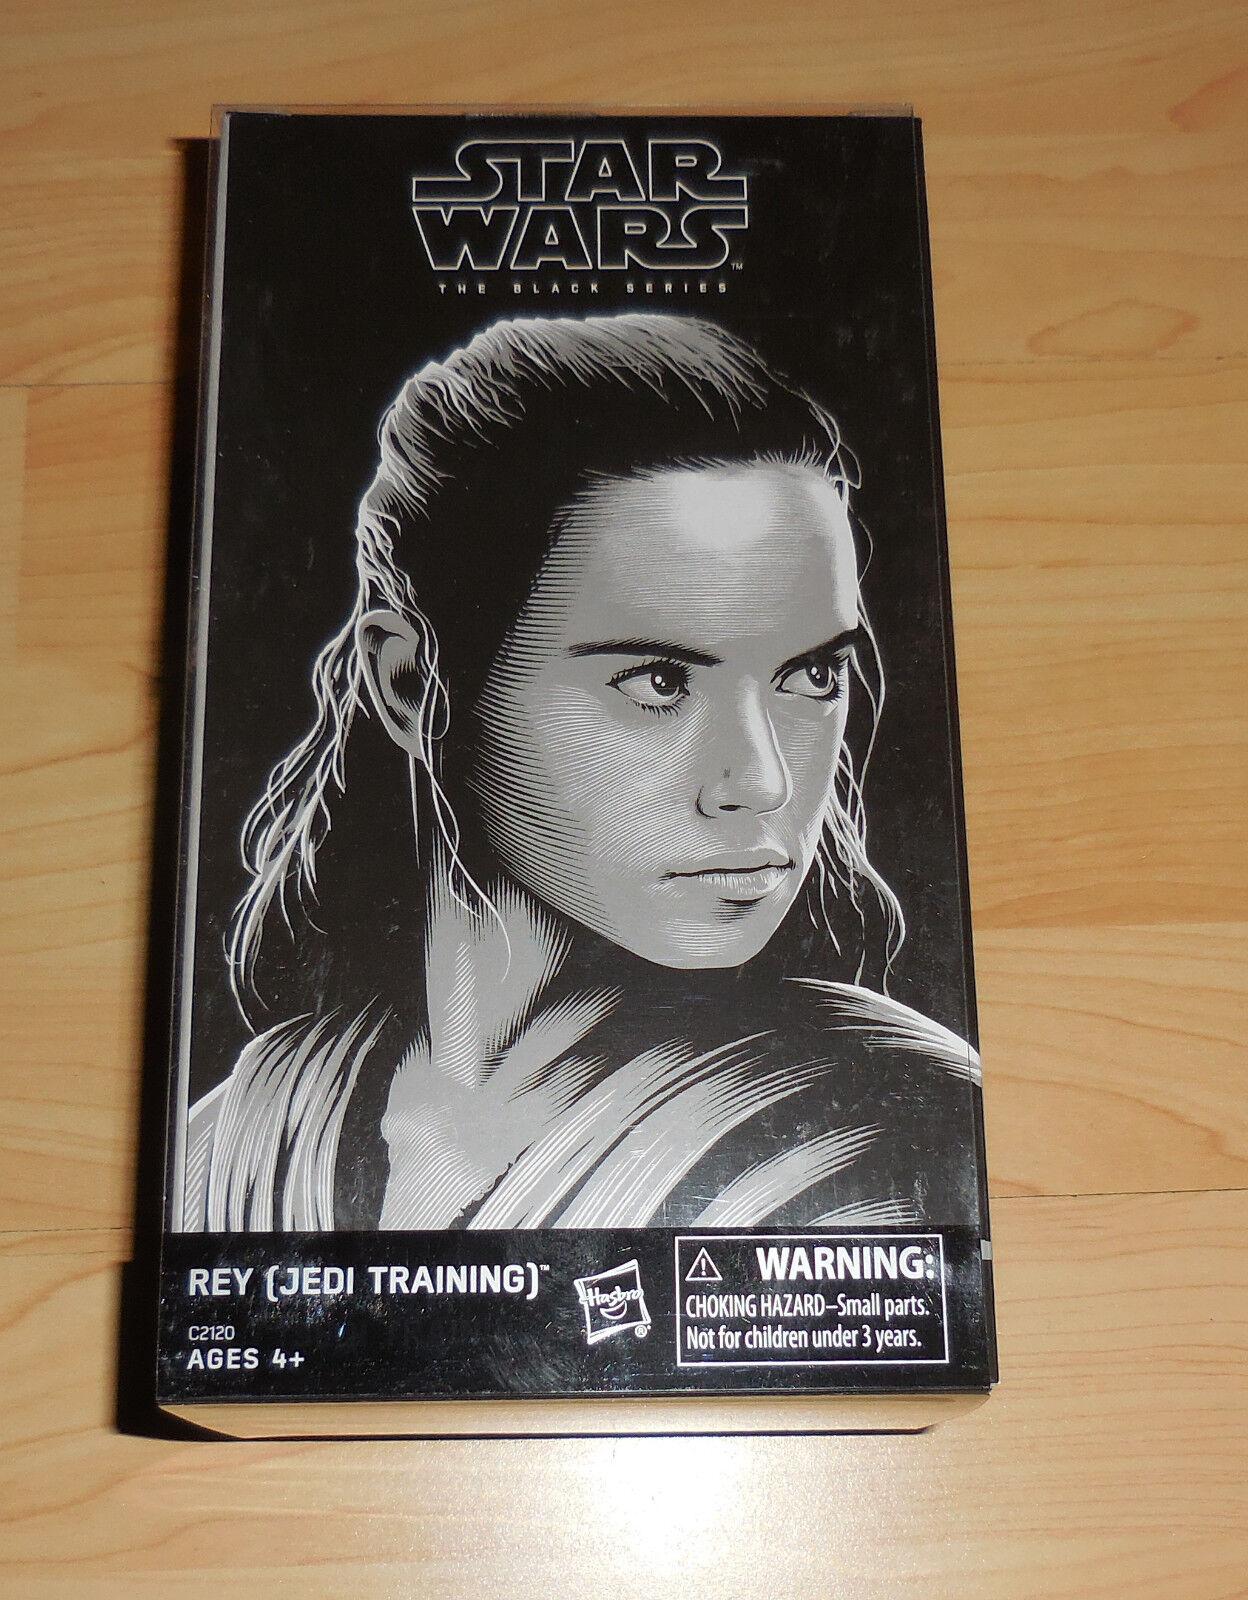 SDCC 2017 HASBRO STAR WARS LUKE SKYWALKER Master and REY Jedi Training MisB